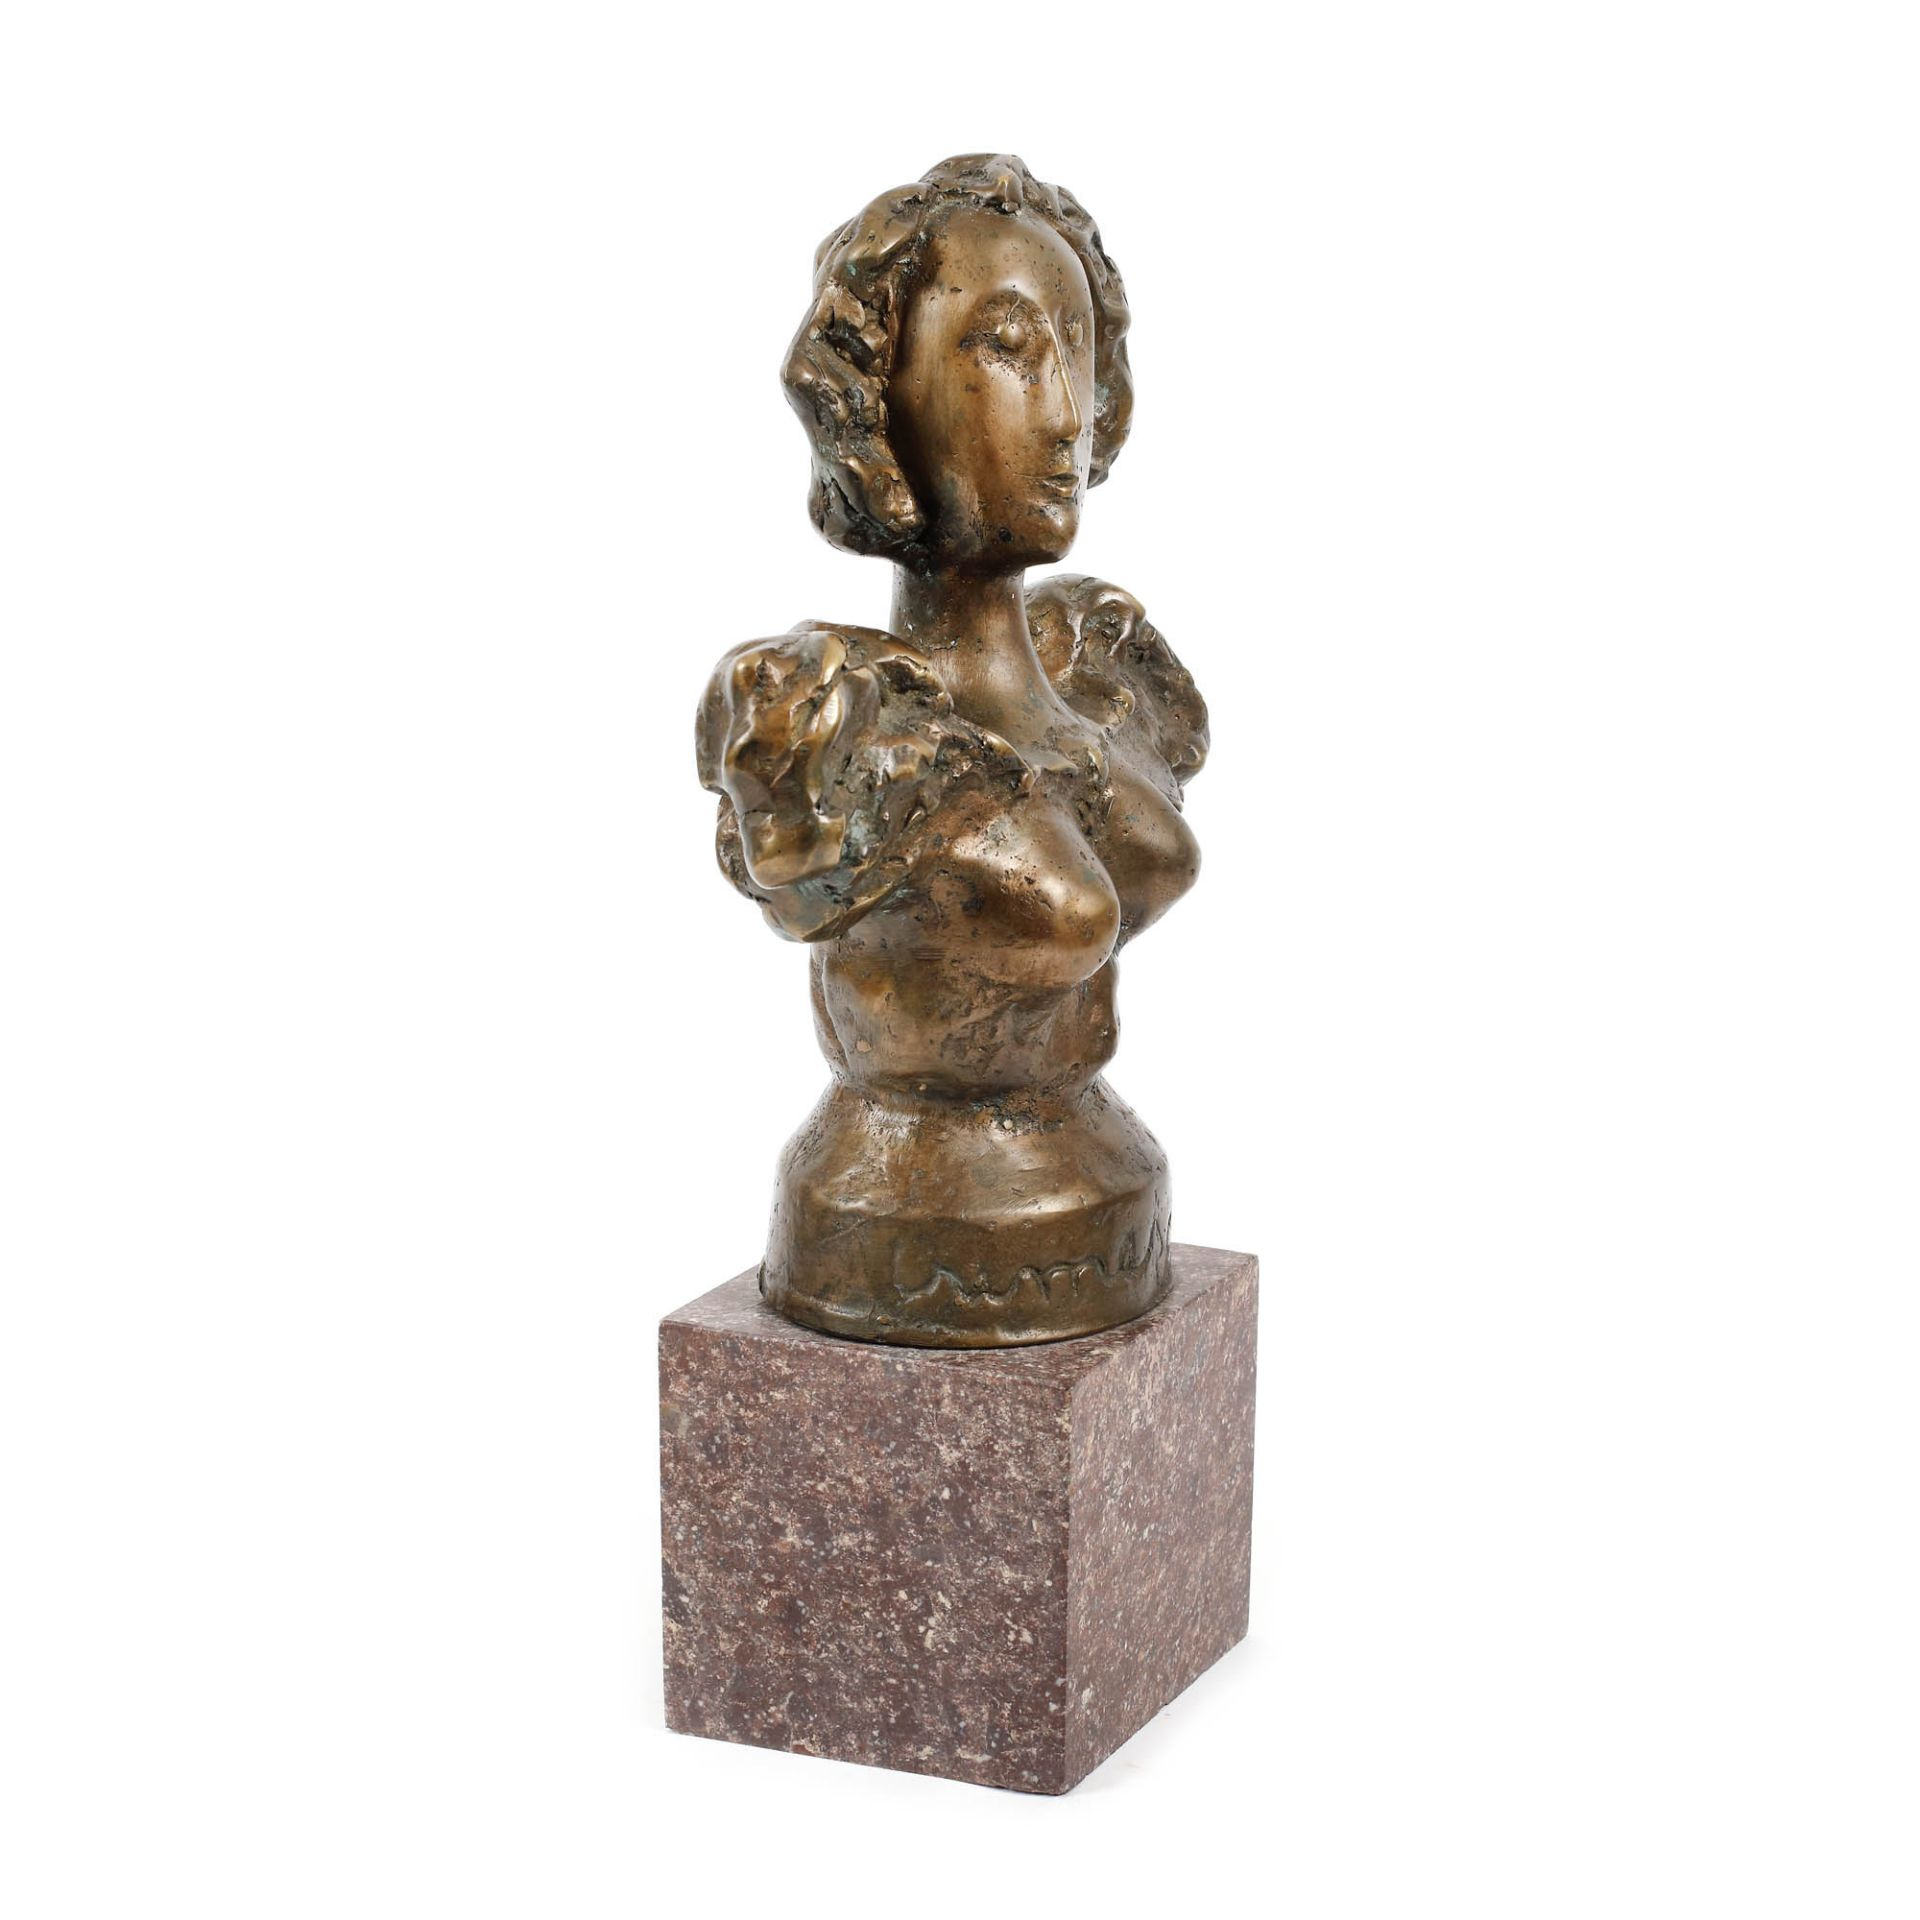 "Ion Irimescu, MuseIon Irimescu, Muse, bronze, 27 × 10 × 22 cm, signed at the base, ""irimescu - Bild 2 aus 3"